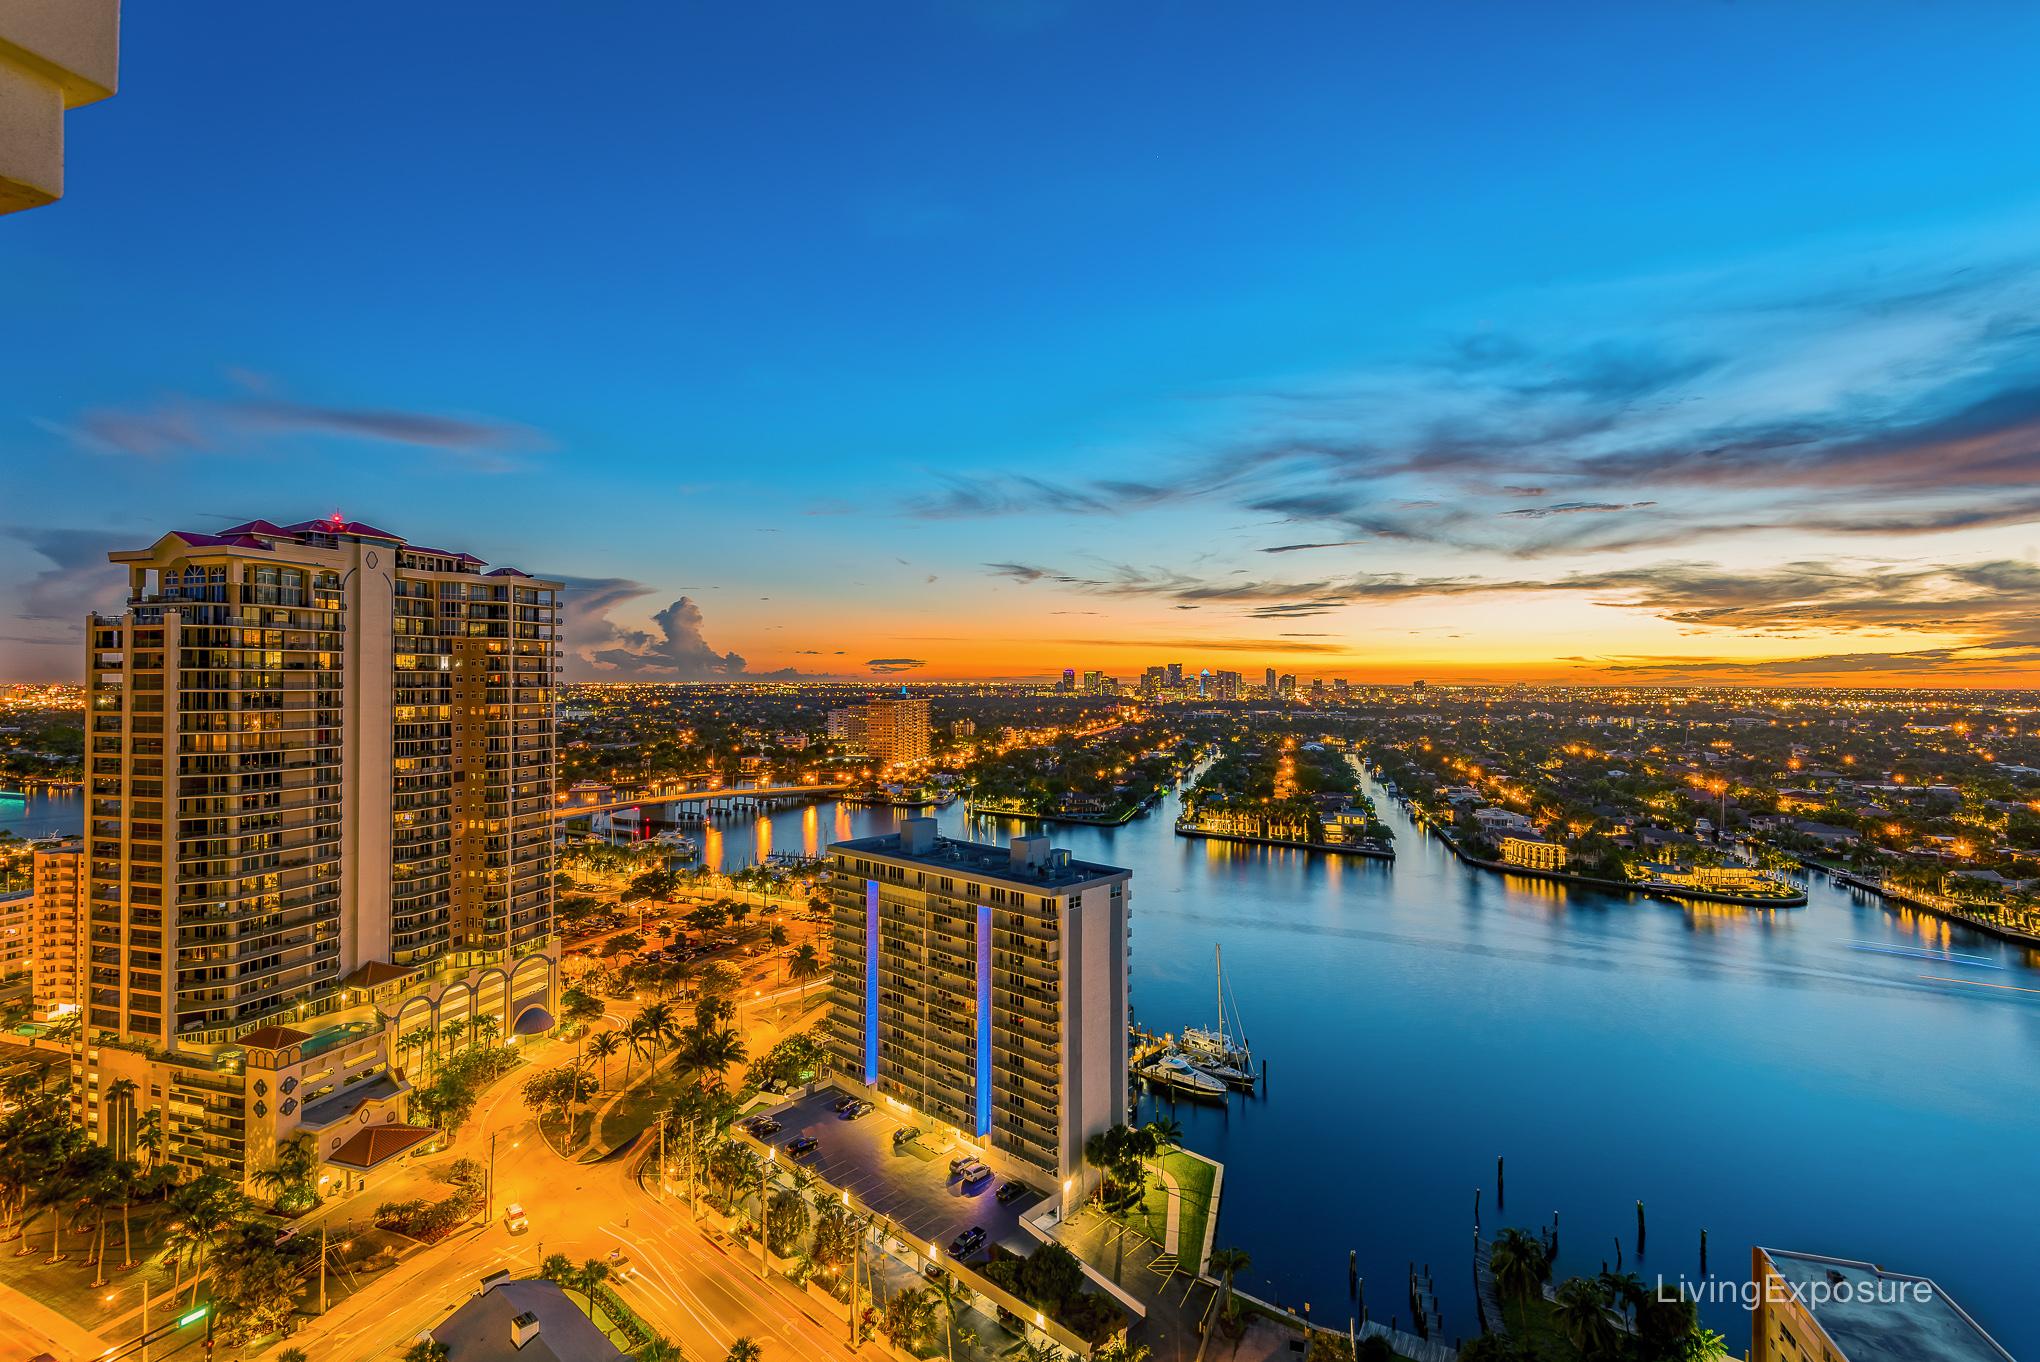 Sunset - Fortlauderdale Skyline